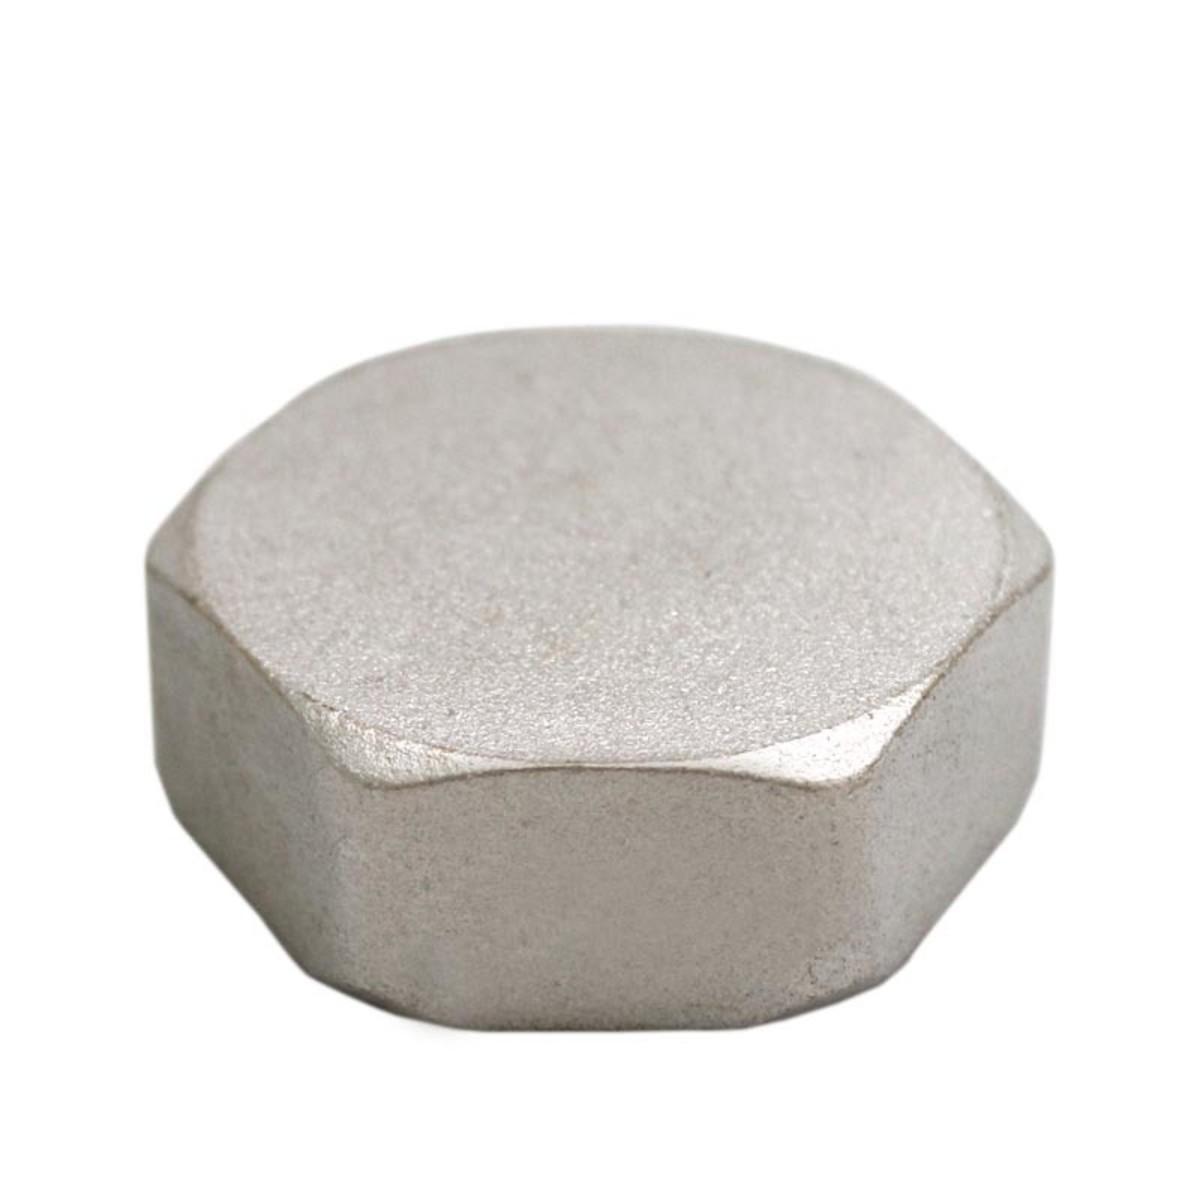 Заглушка внутренняя резьба 1 никелированная латунь